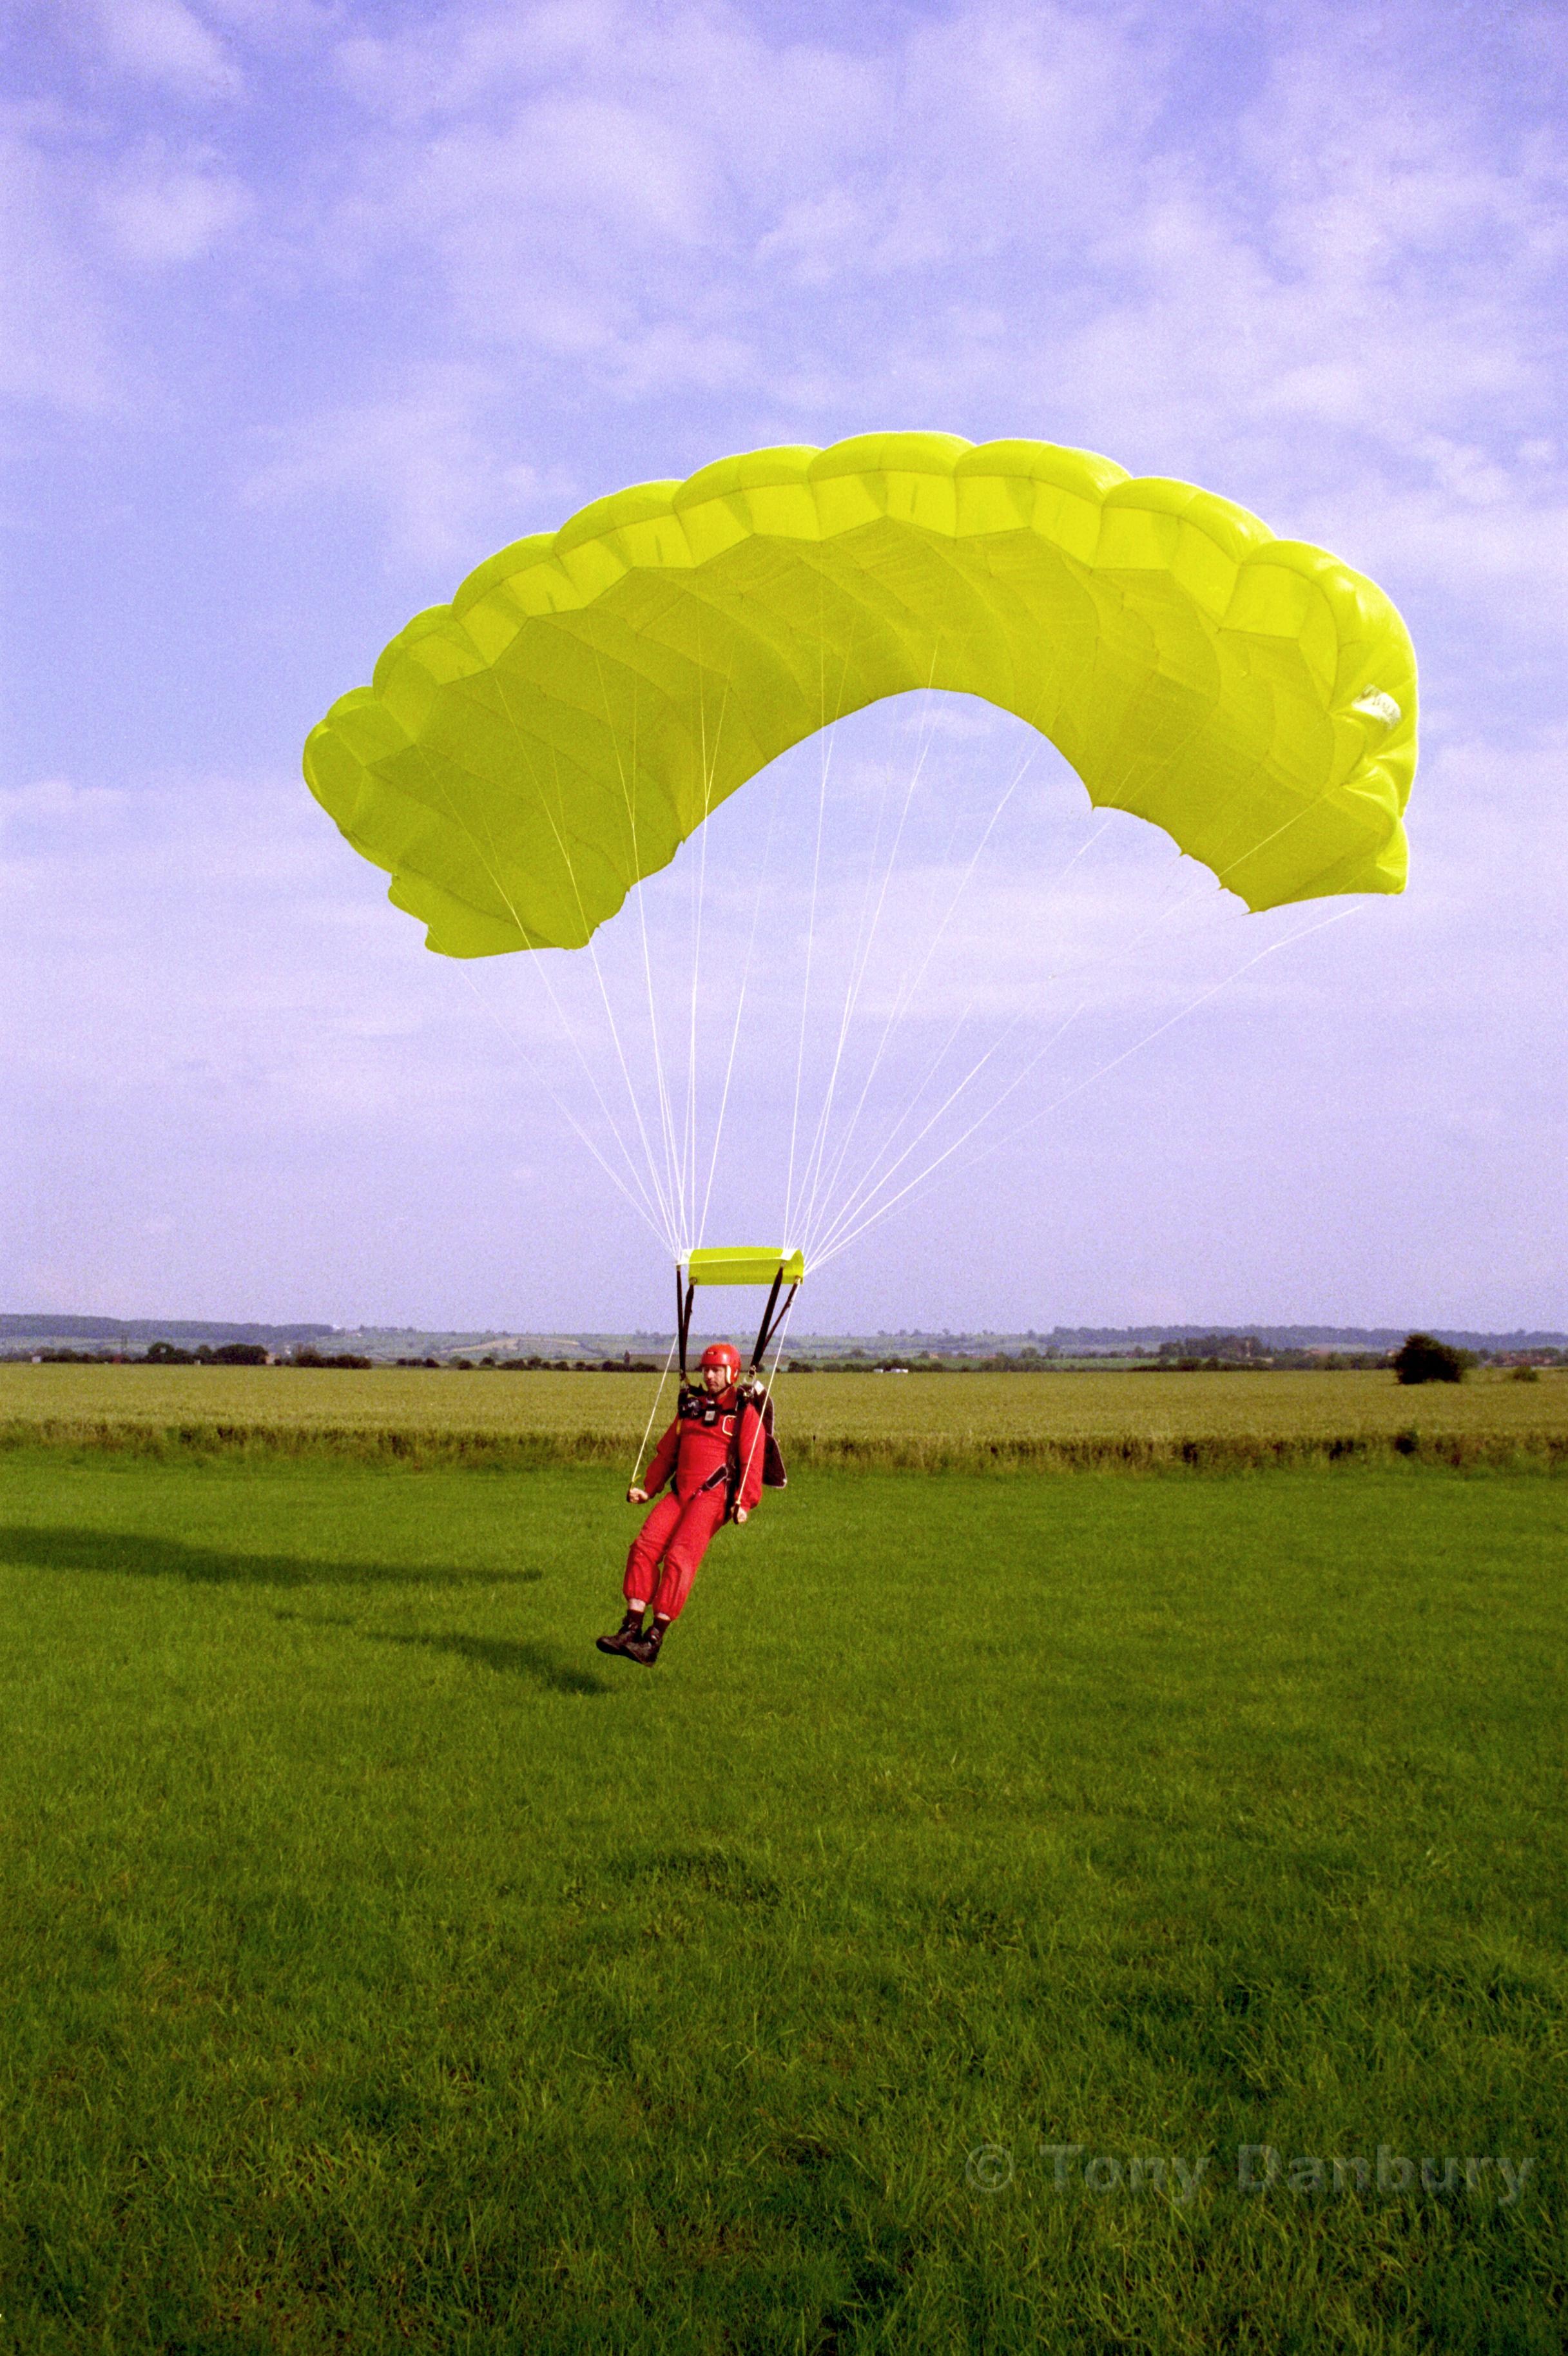 Gary Marshall executes a full flare landing